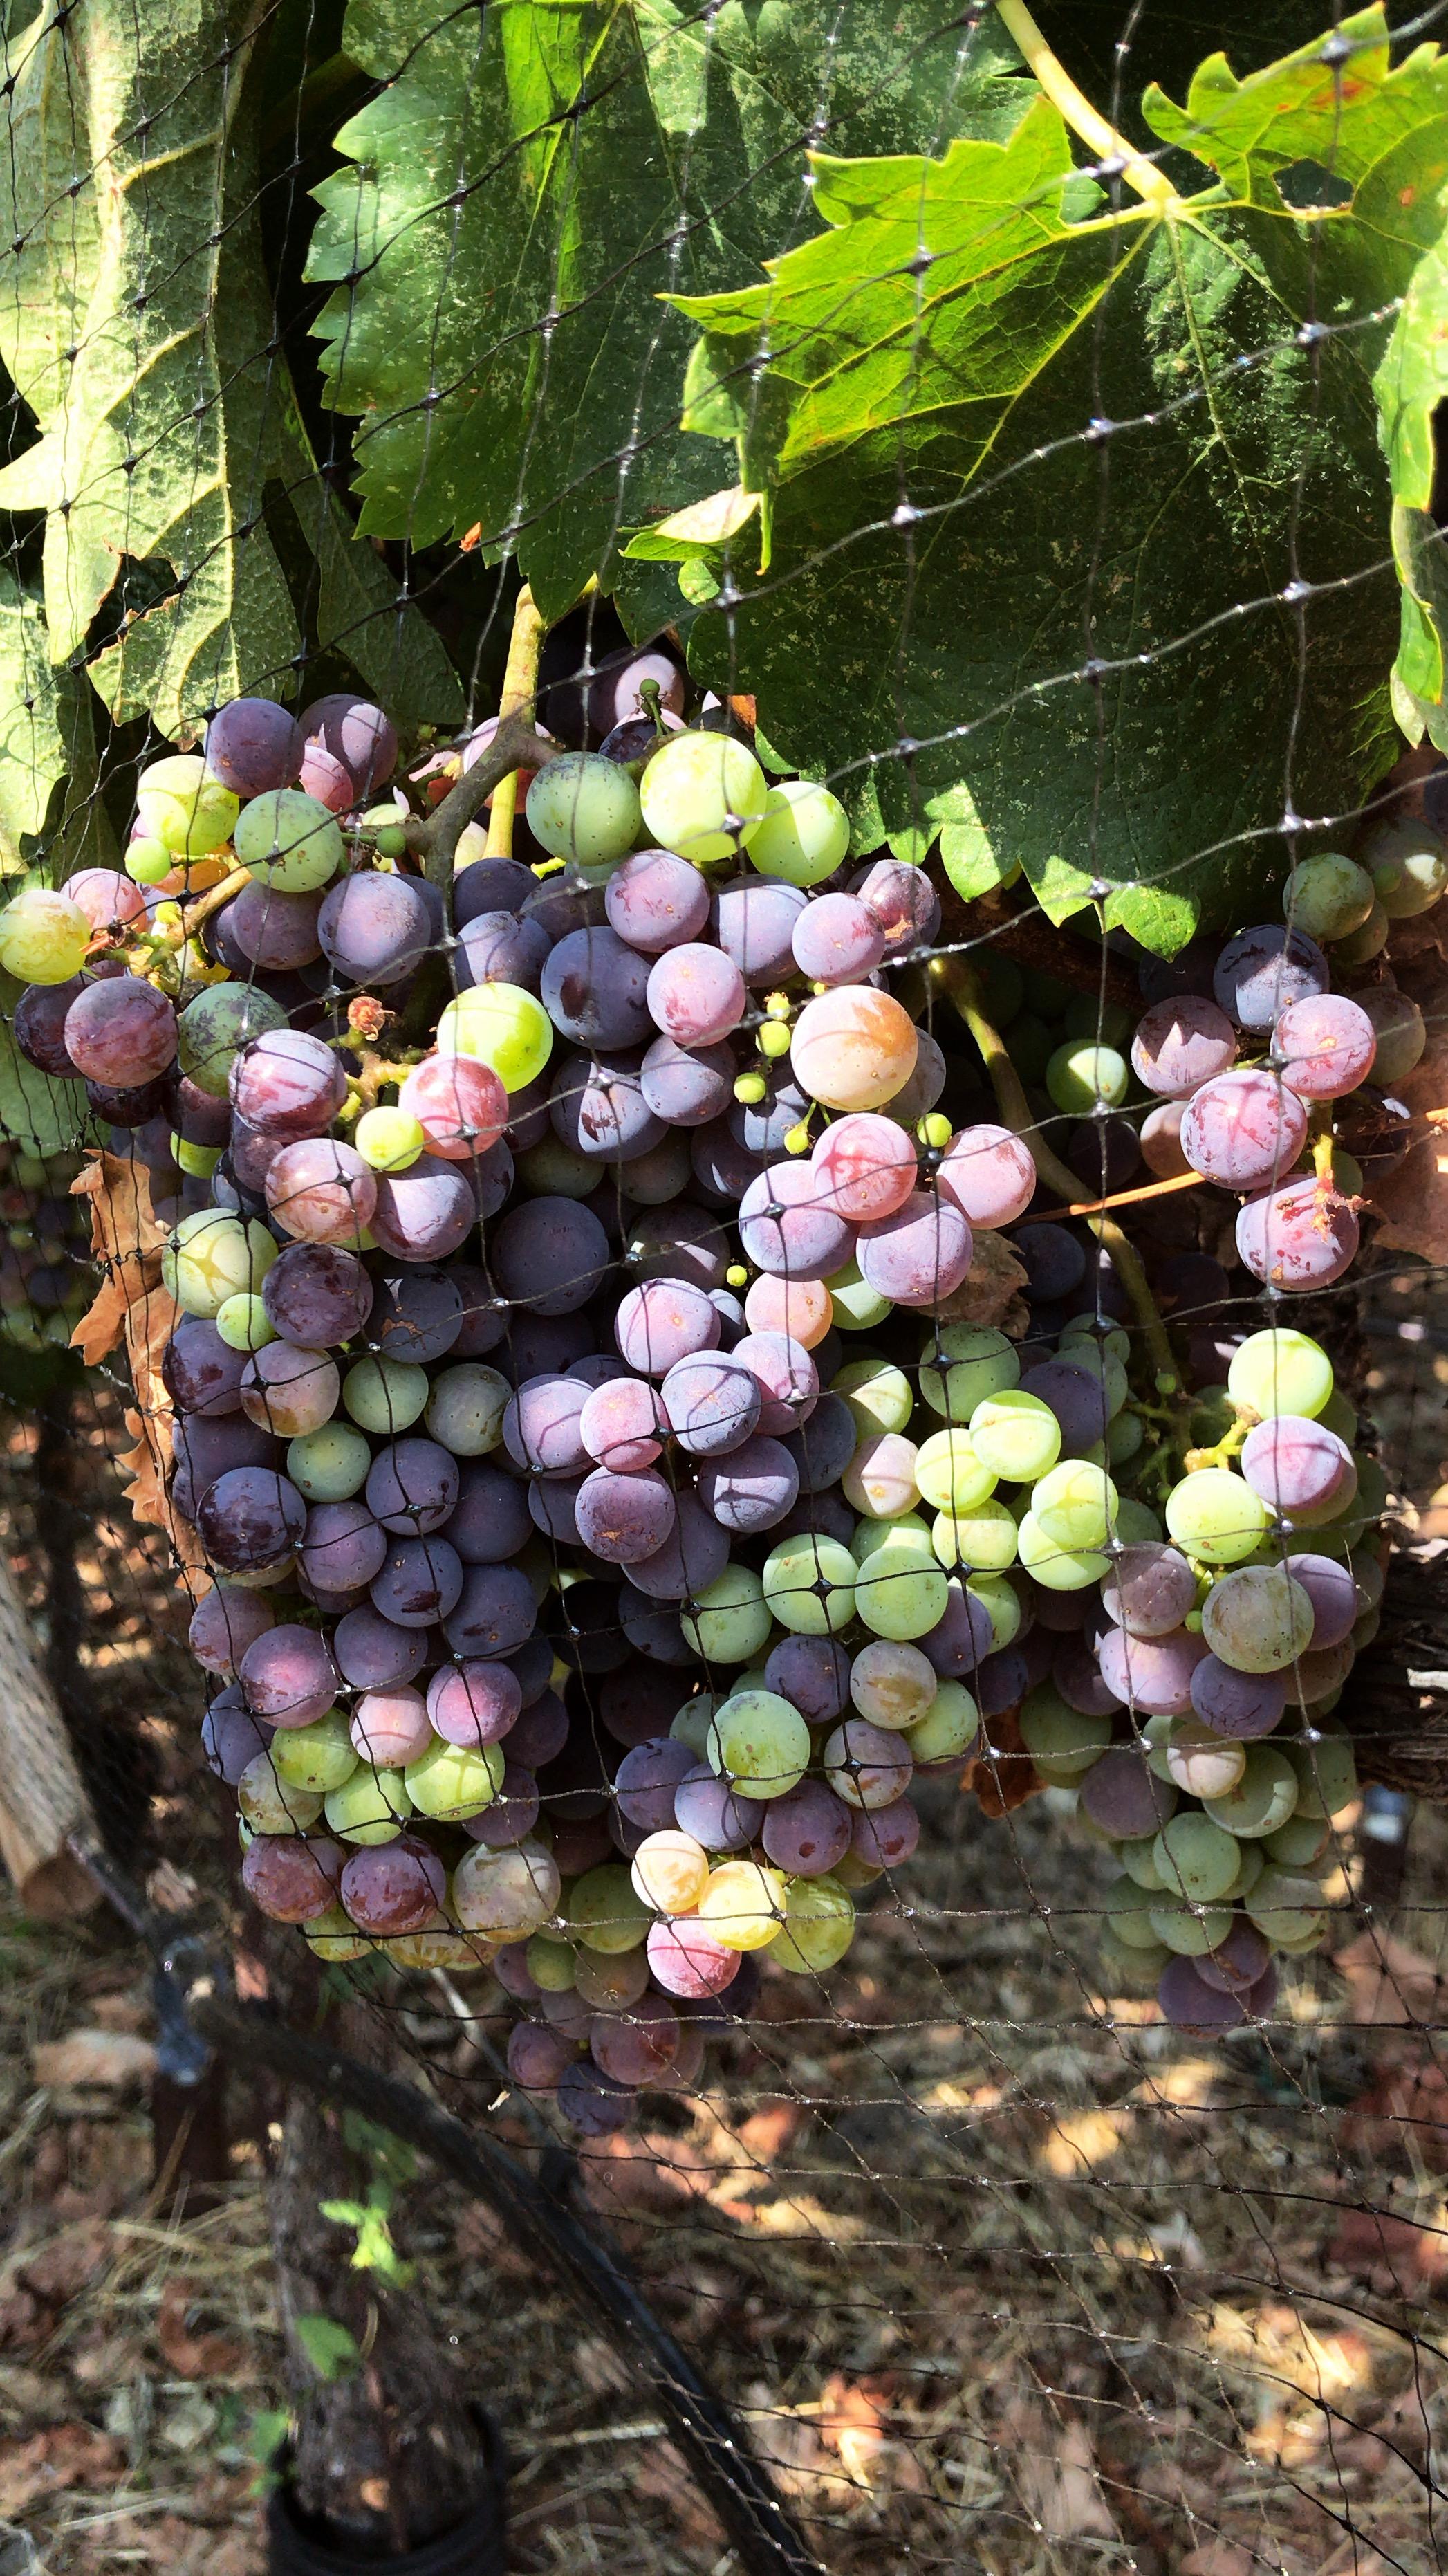 Grapes on vine ripening before harvest time